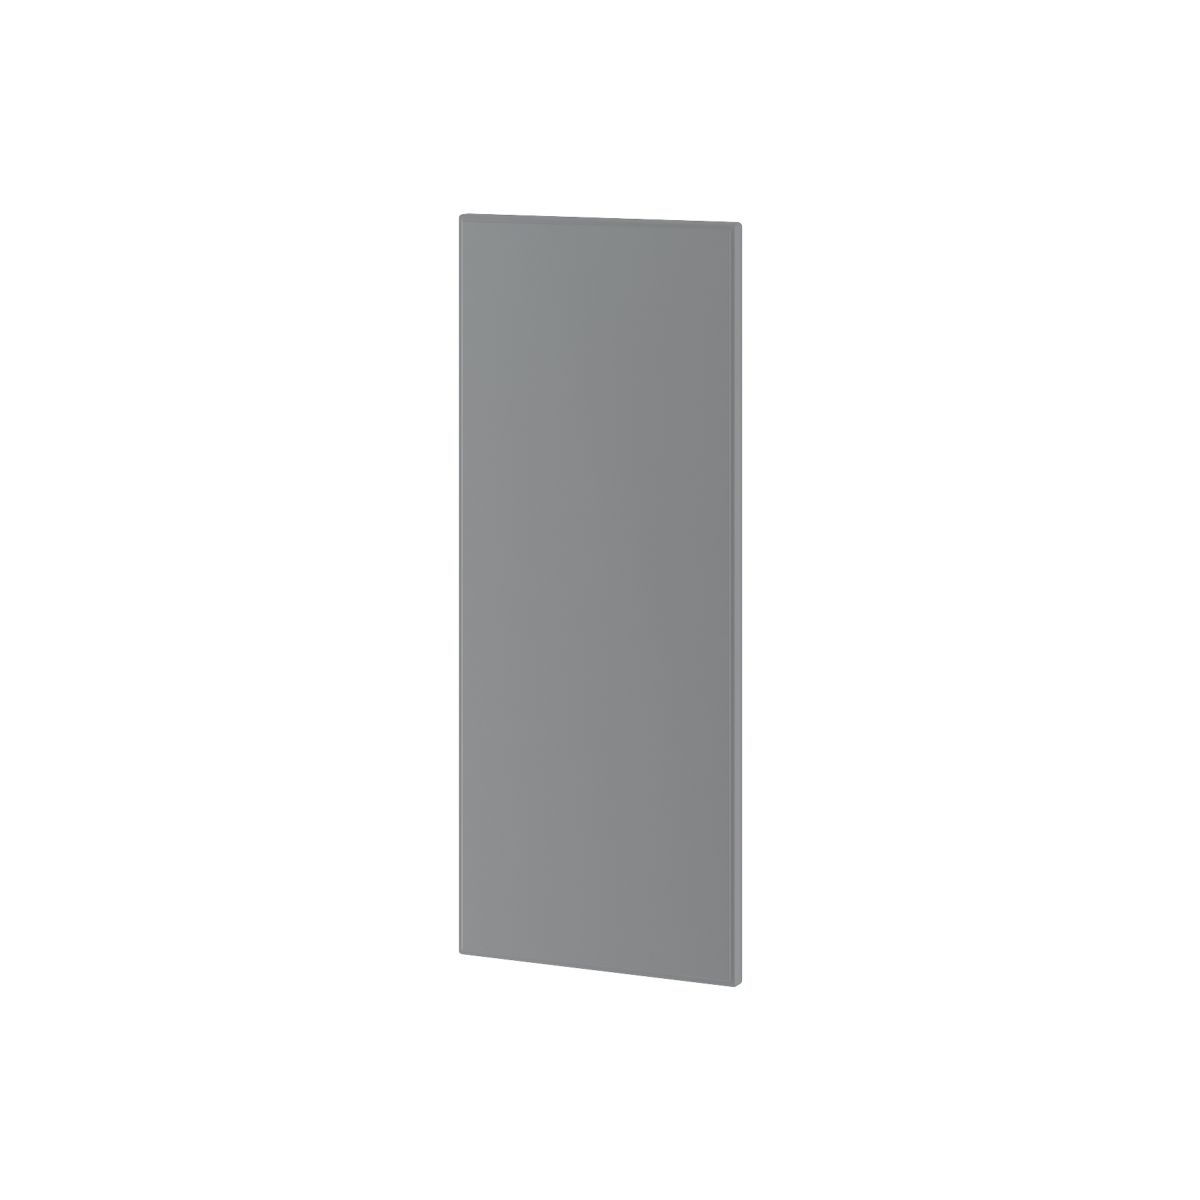 LAYMAN - LORA Panel 72/30 panel boczny szafka górna